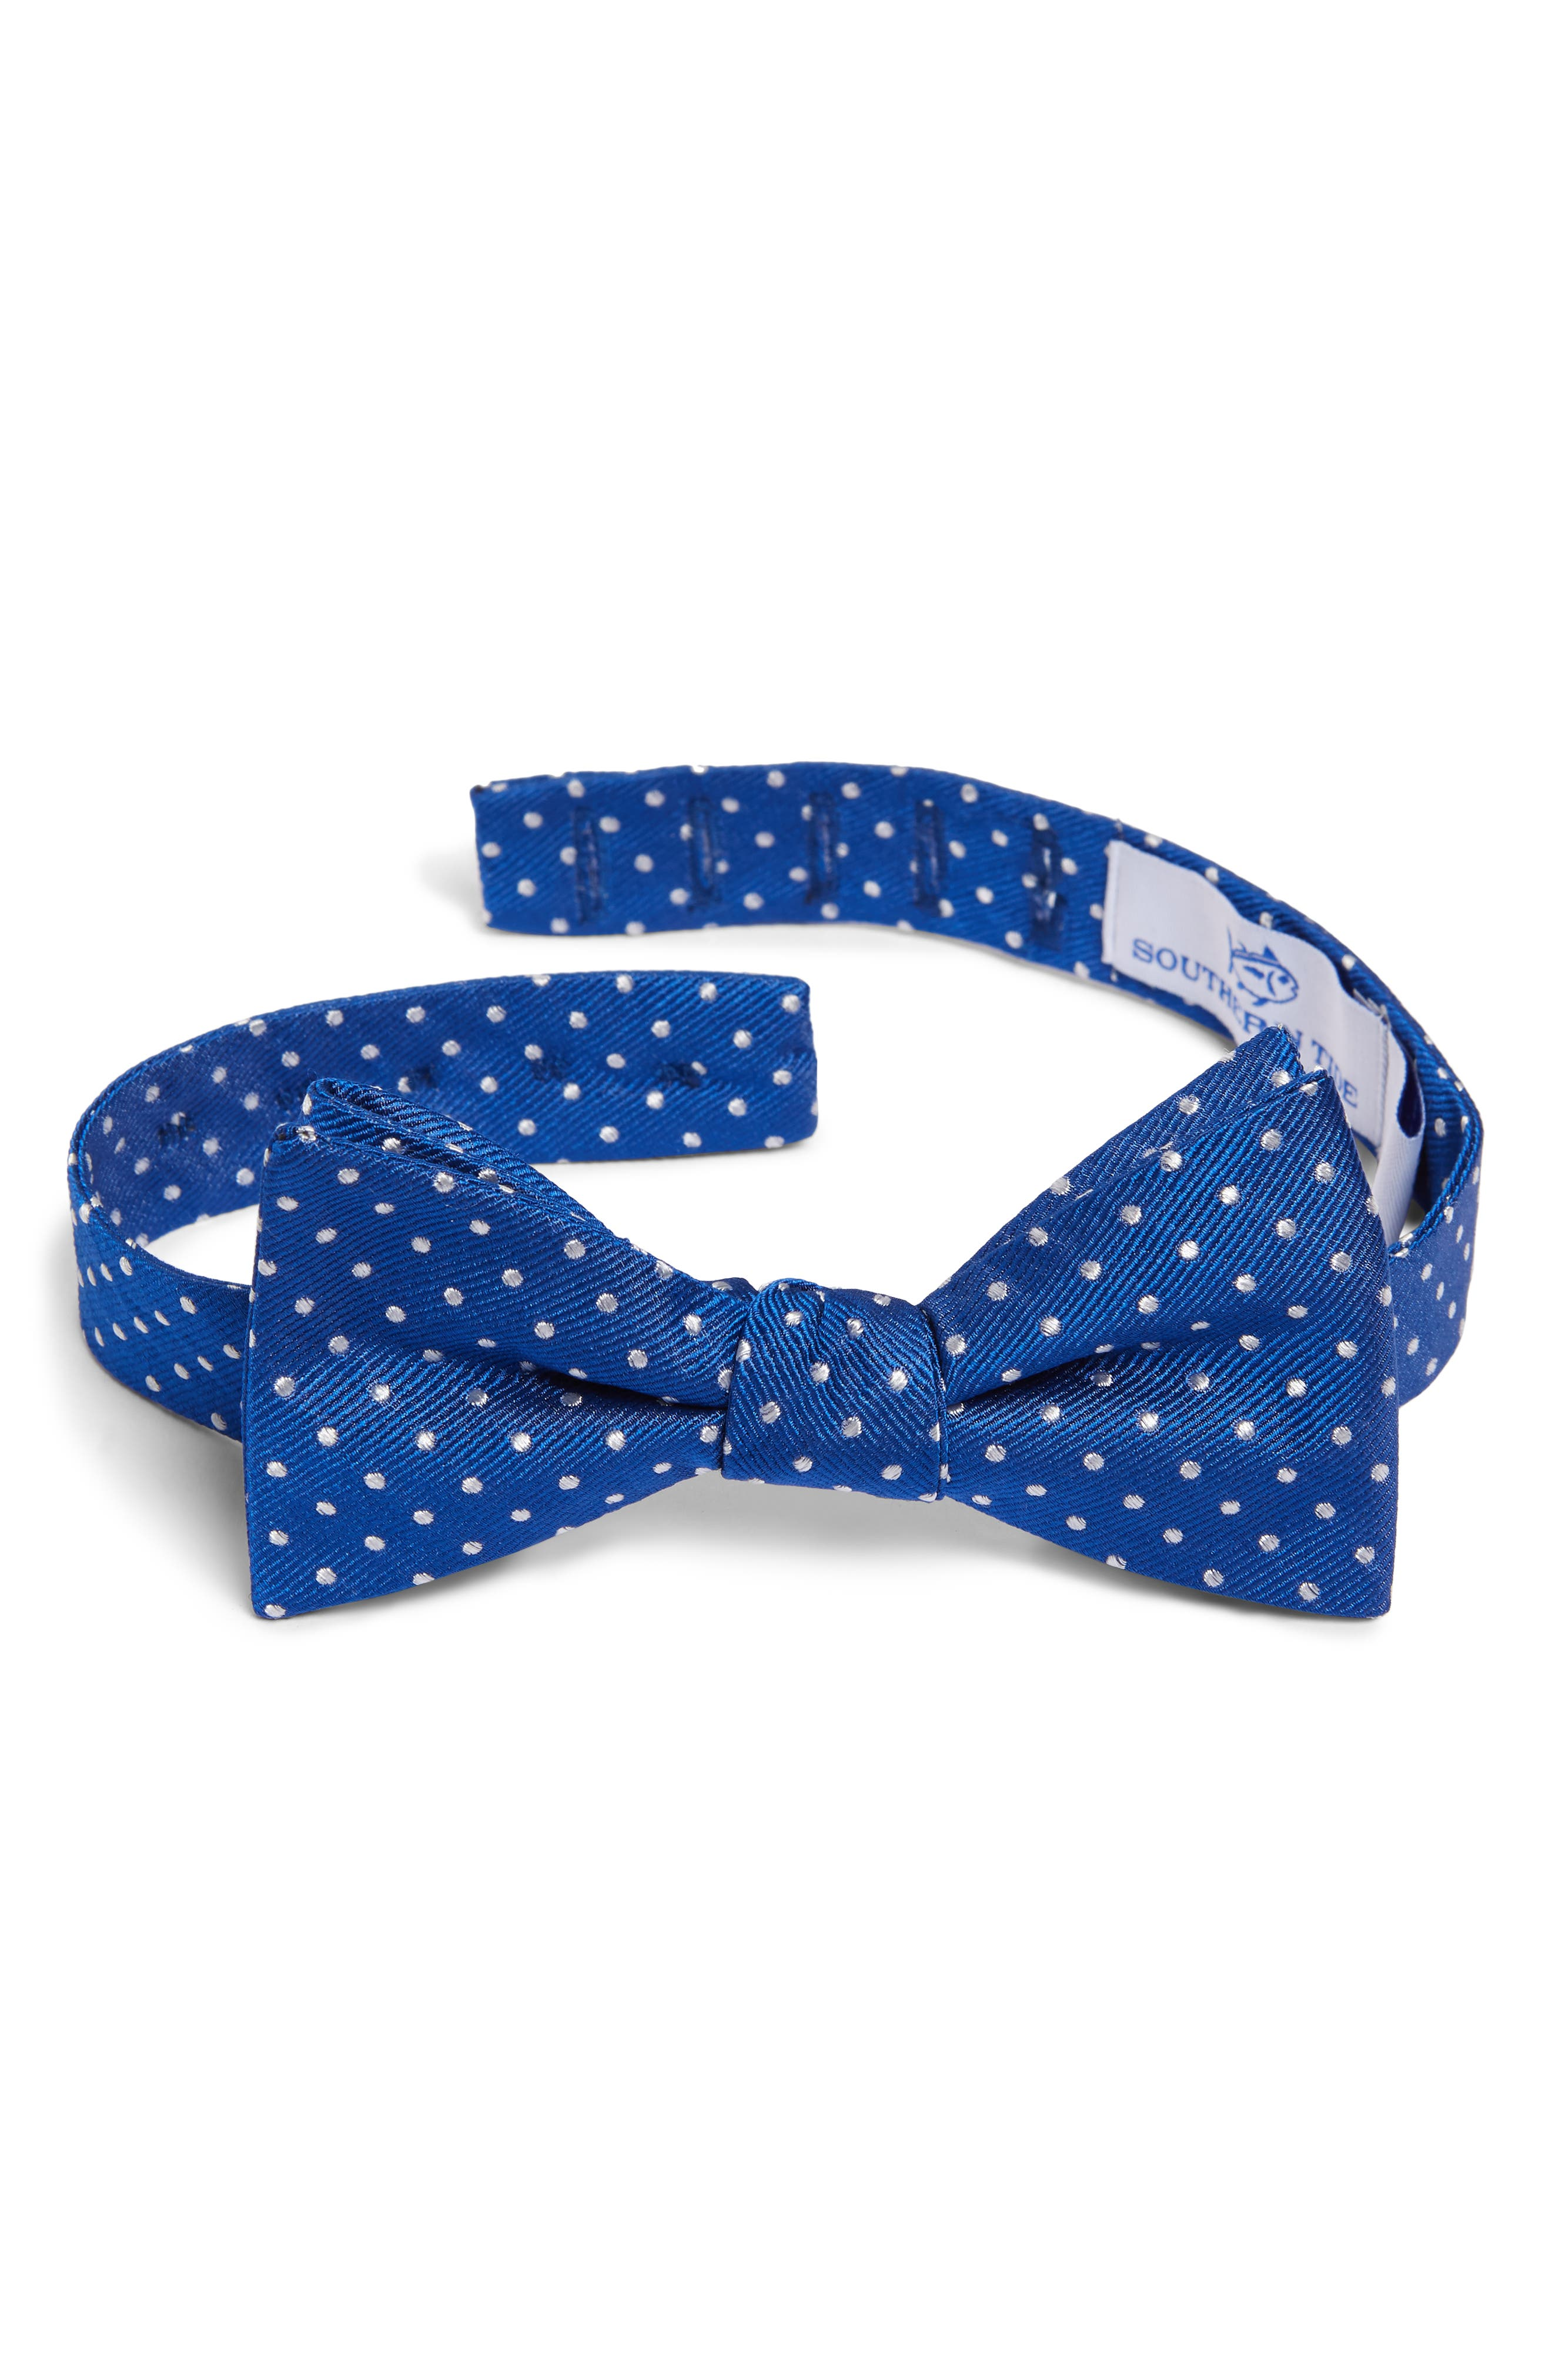 1940s Mens Ties | Wide Ties & Painted Ties Mens Southern Tide Portside Dot Silk Bow Tie Size Regular - Blue $39.75 AT vintagedancer.com